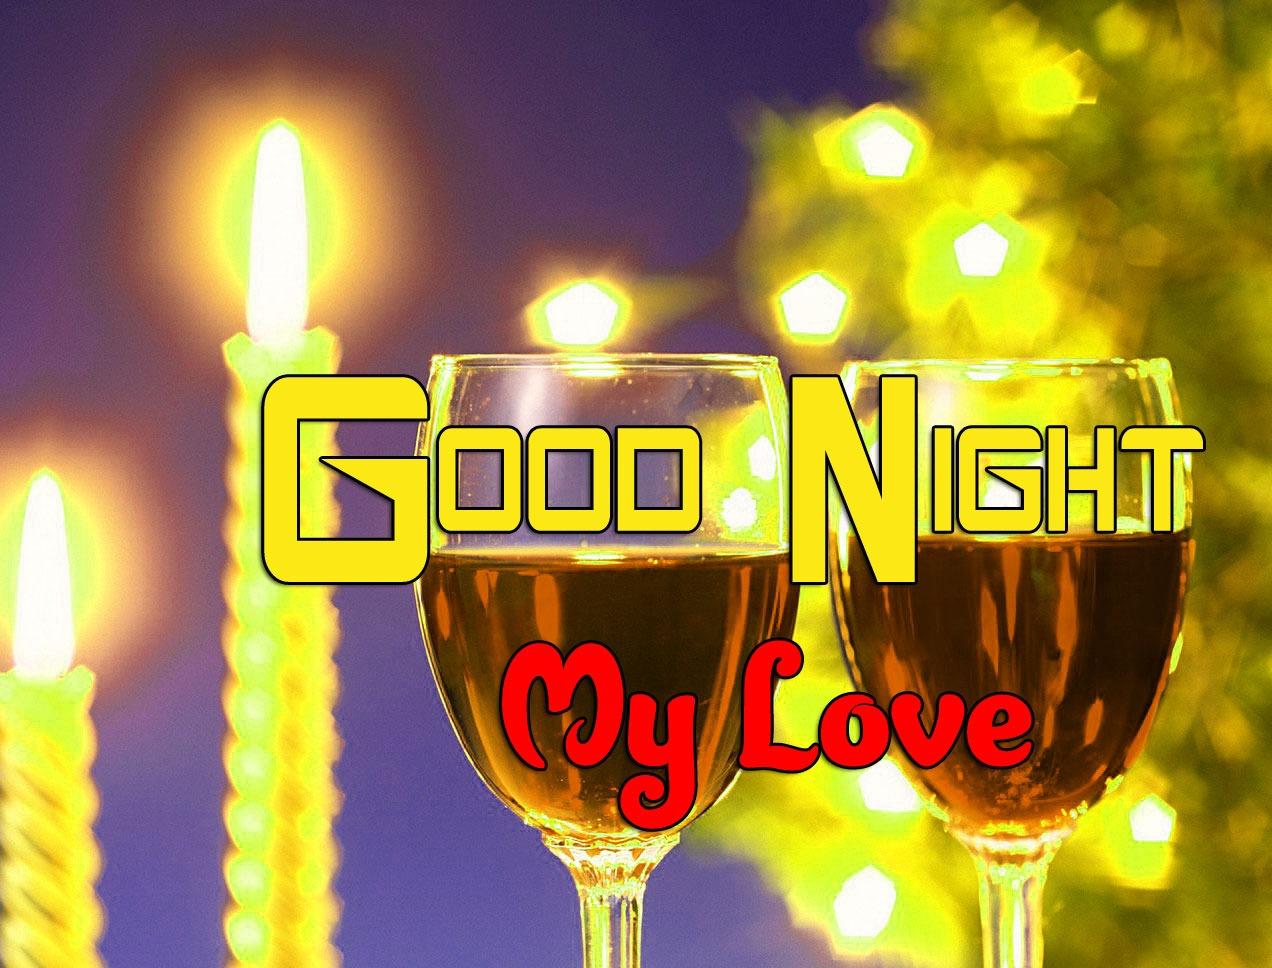 Latest P Good Night Images Wallpaper